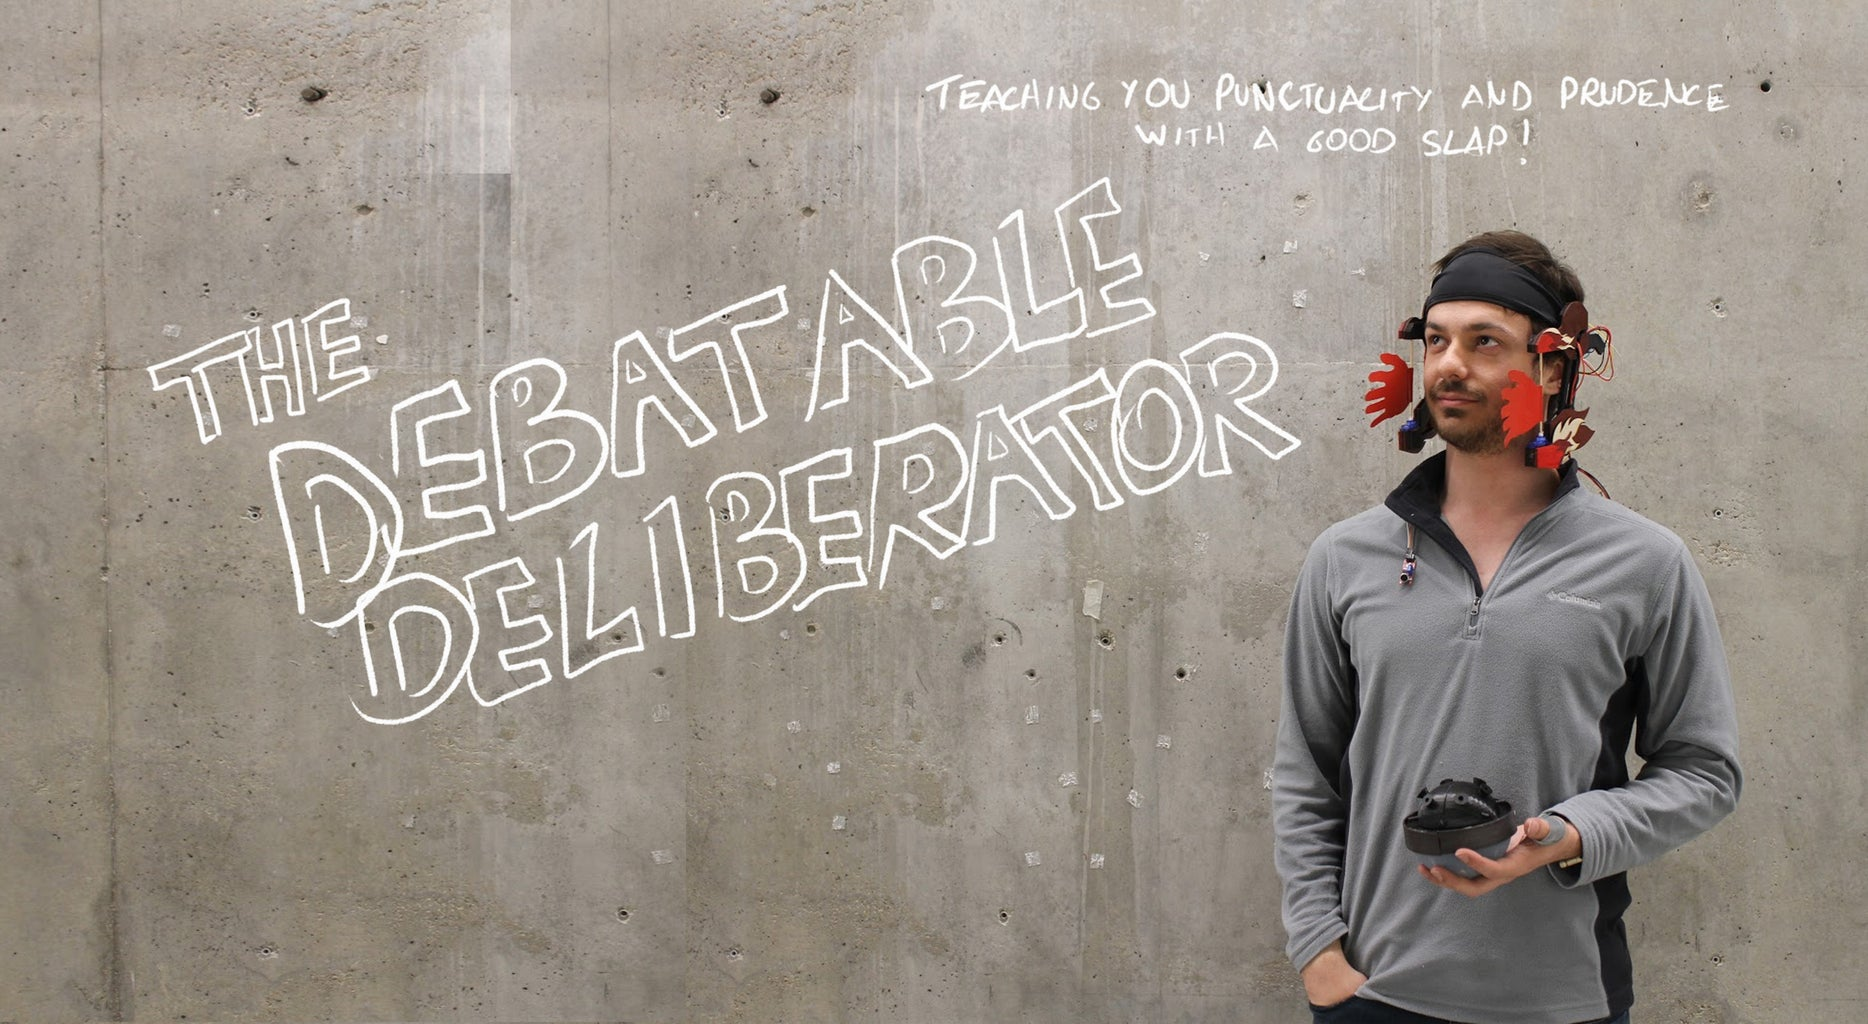 The Debatable Deliberator